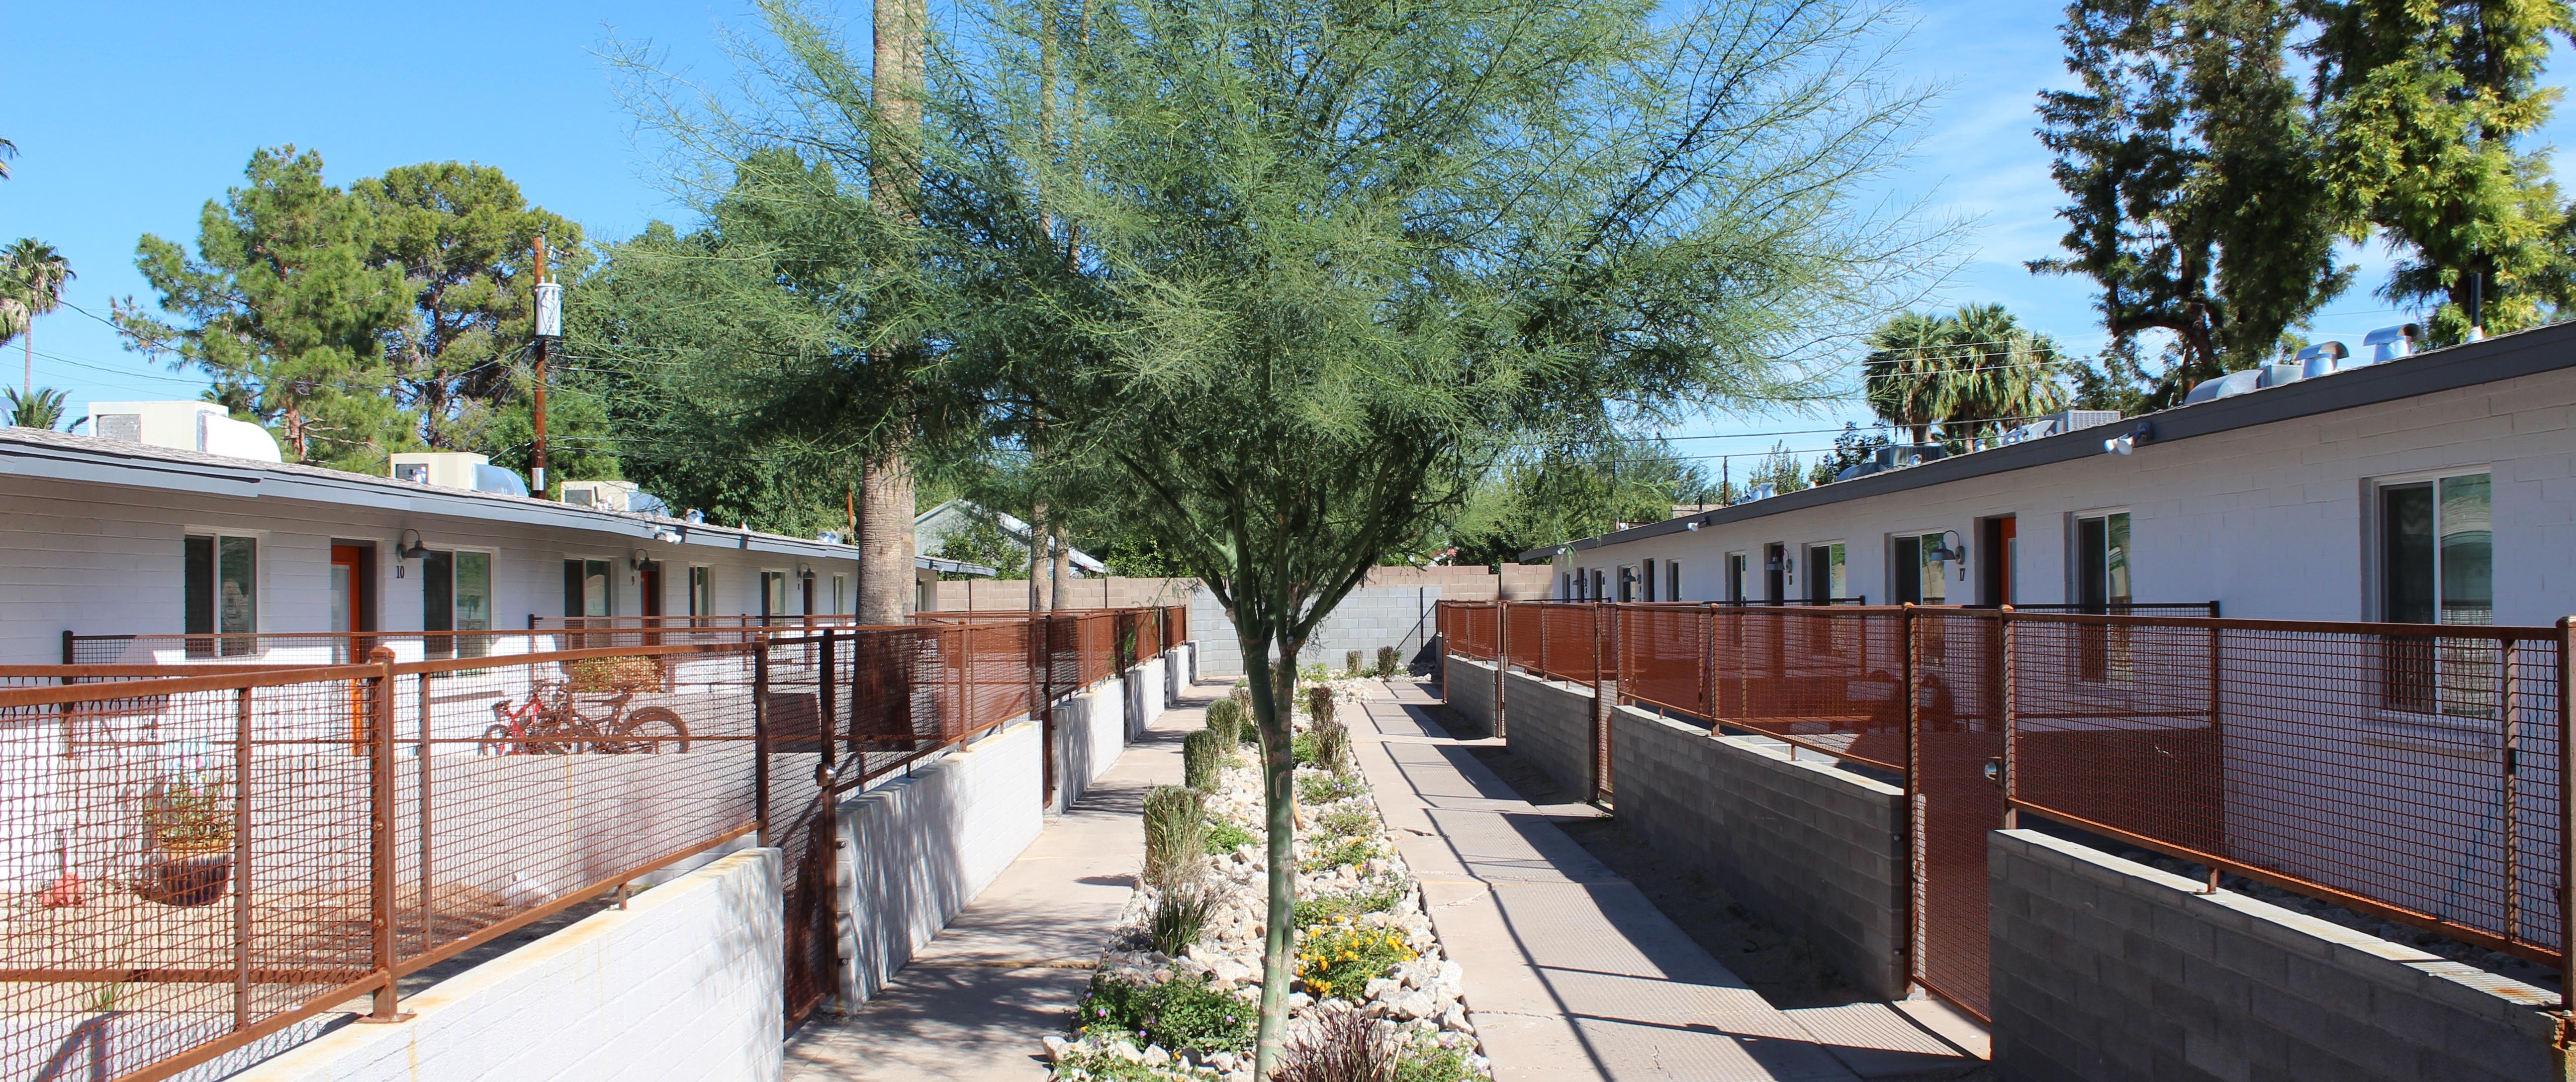 MODE Biltmore @ 27th Street N | 4231 N 27th St, Phoenix, AZ 85016